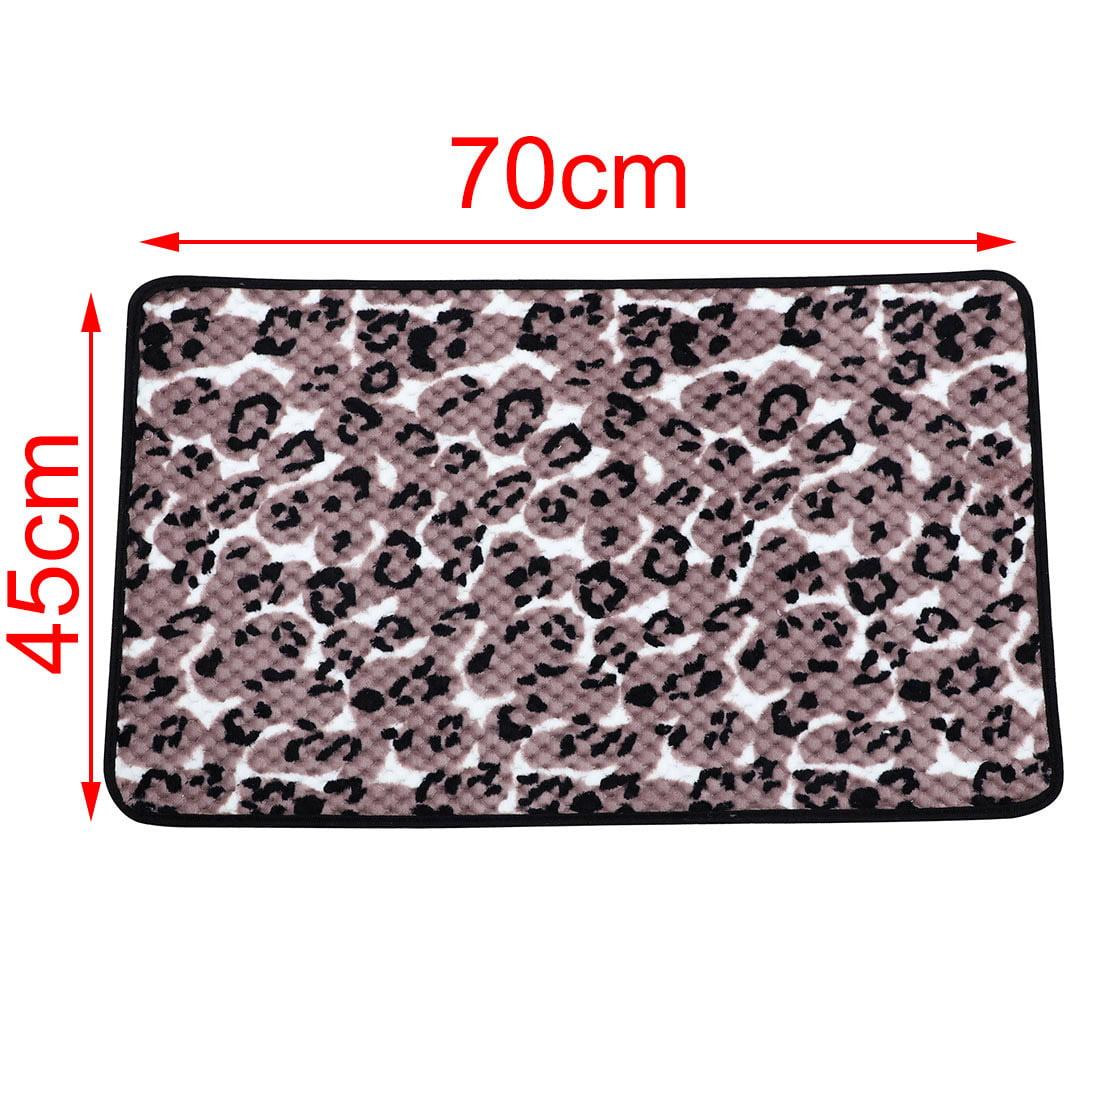 Leopard Print Kitchen Floor Mat Area Rug Carpet 70cm x 45cm Rosy Brown Black